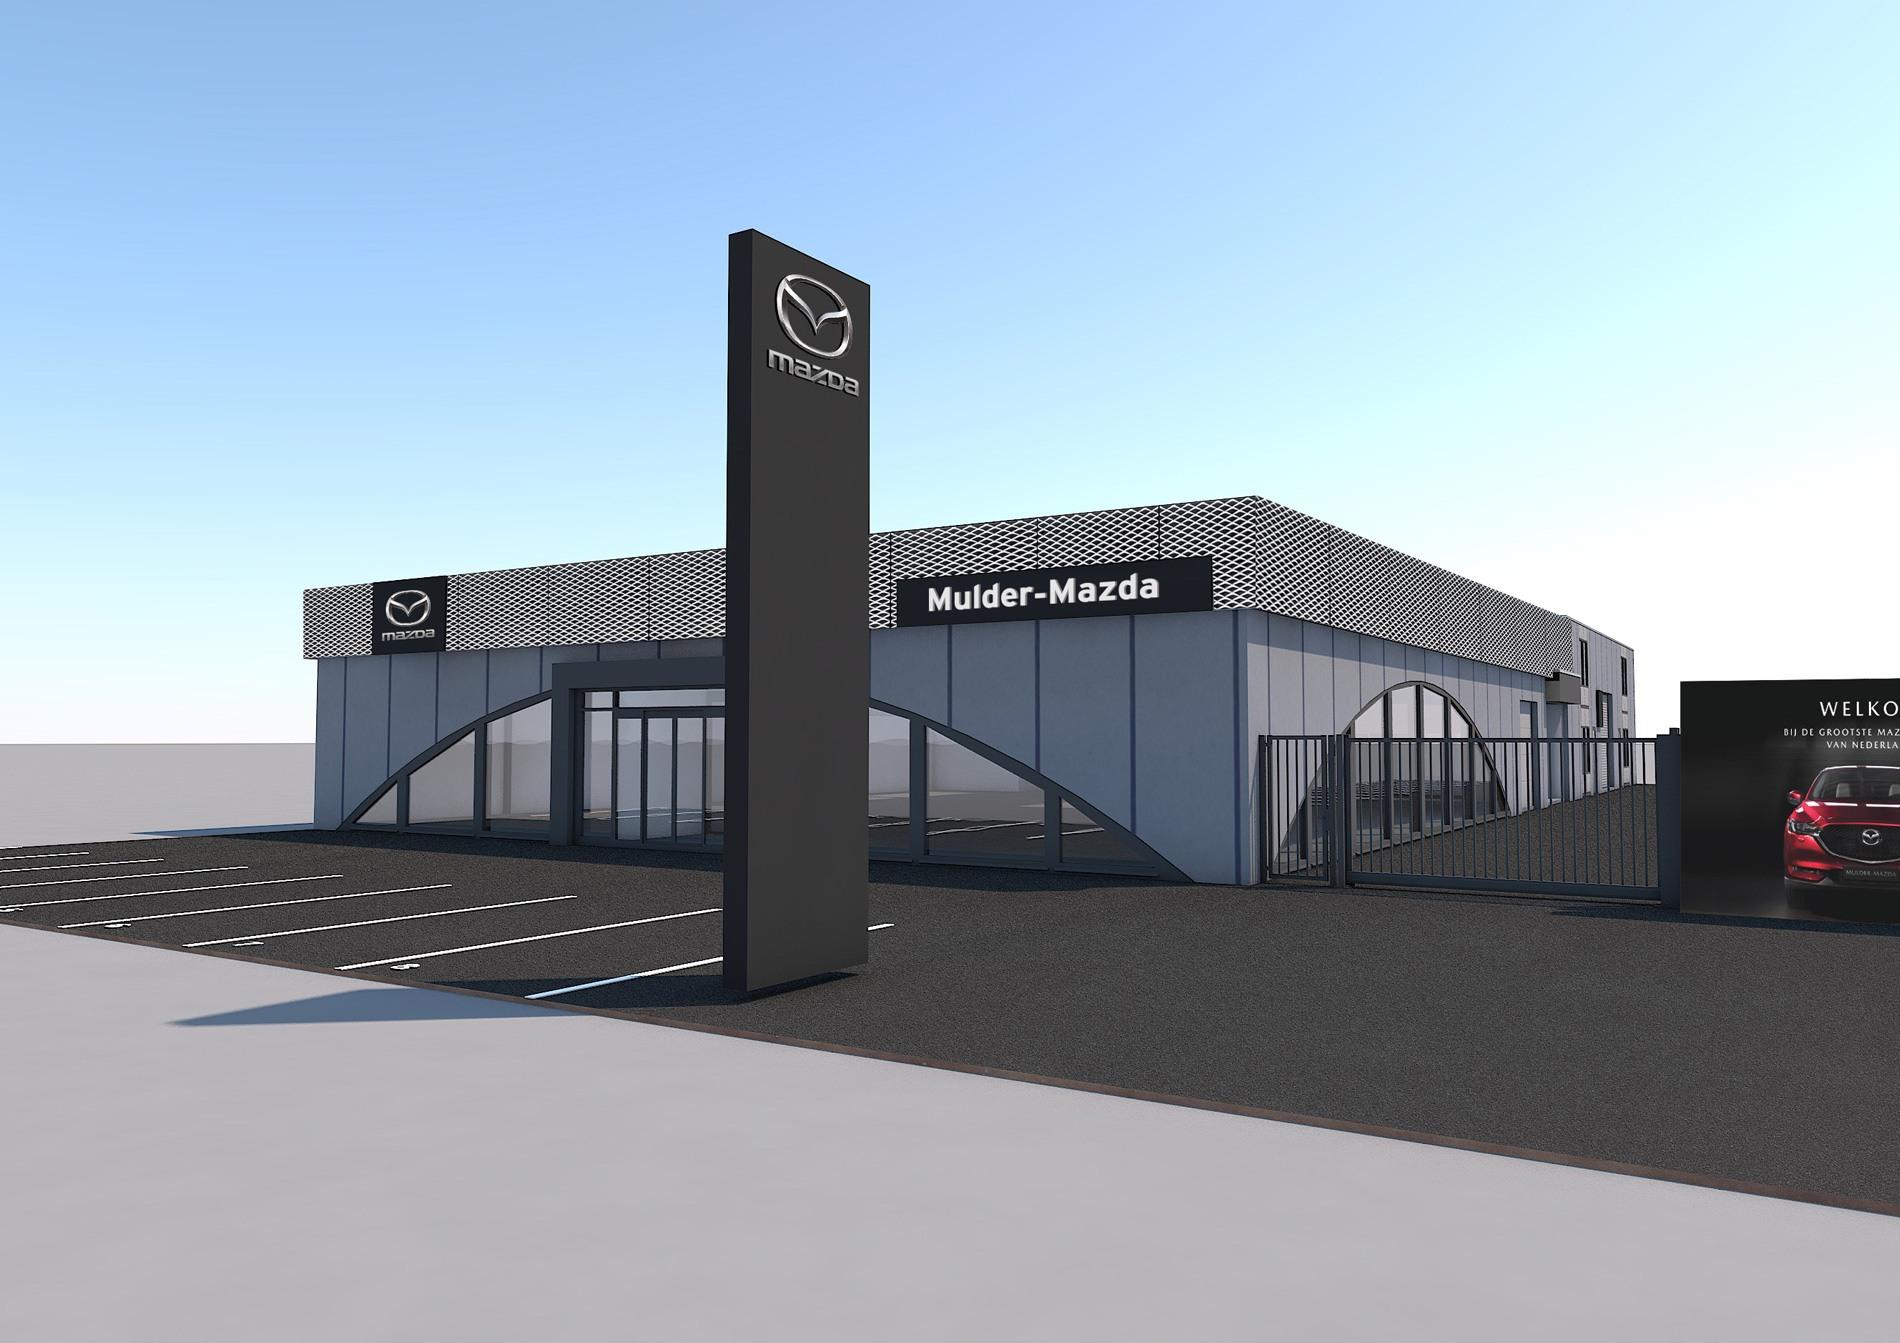 Mulder-Mazda opent nieuwe vestiging in Rotterdam-Zuid!